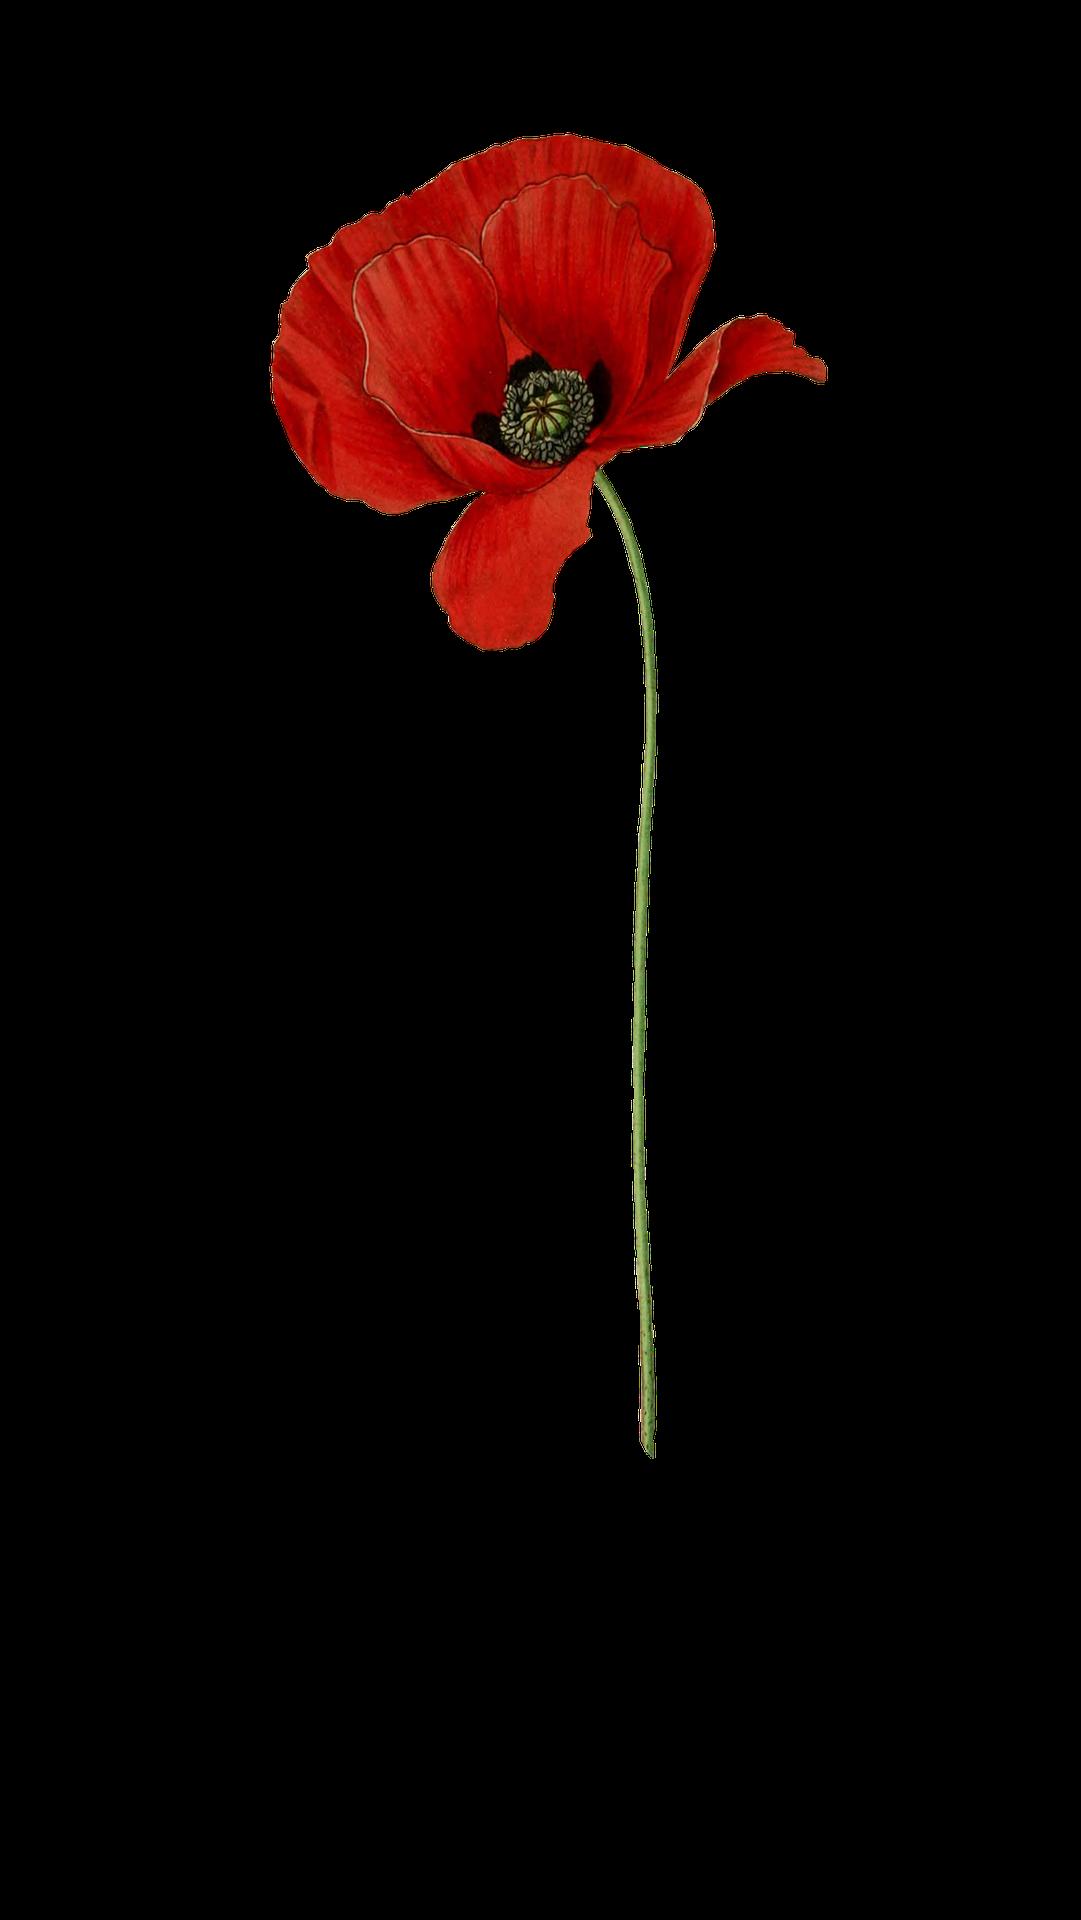 Flower choice image decoration. Poppy clipart anzac poppy